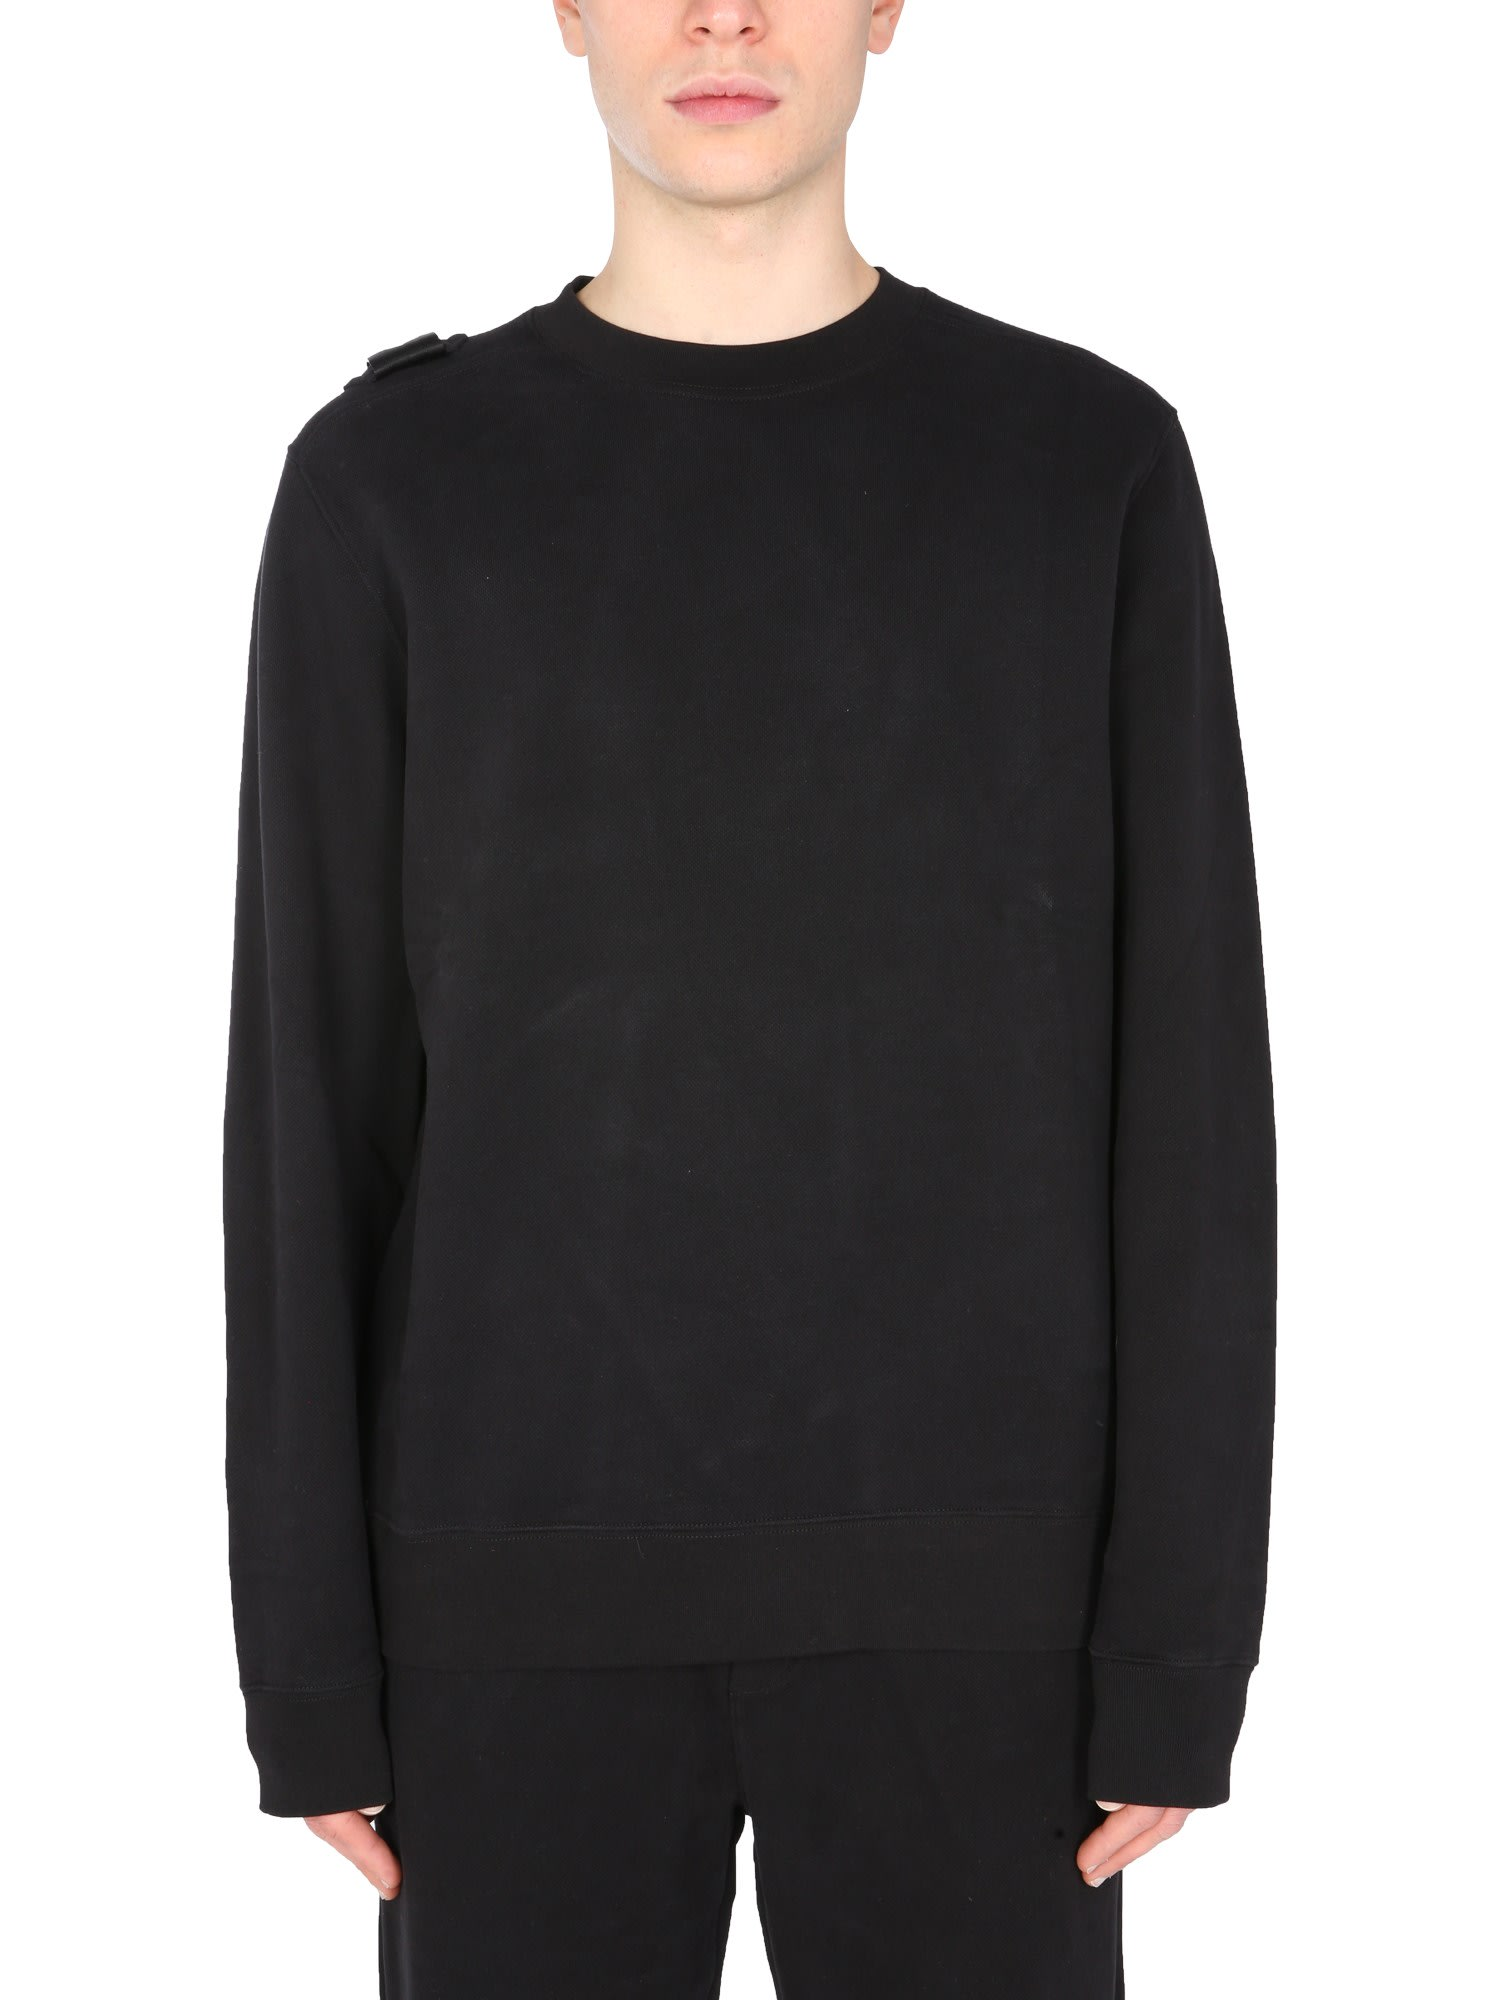 Ma. Strum Crew Neck Sweatshirt